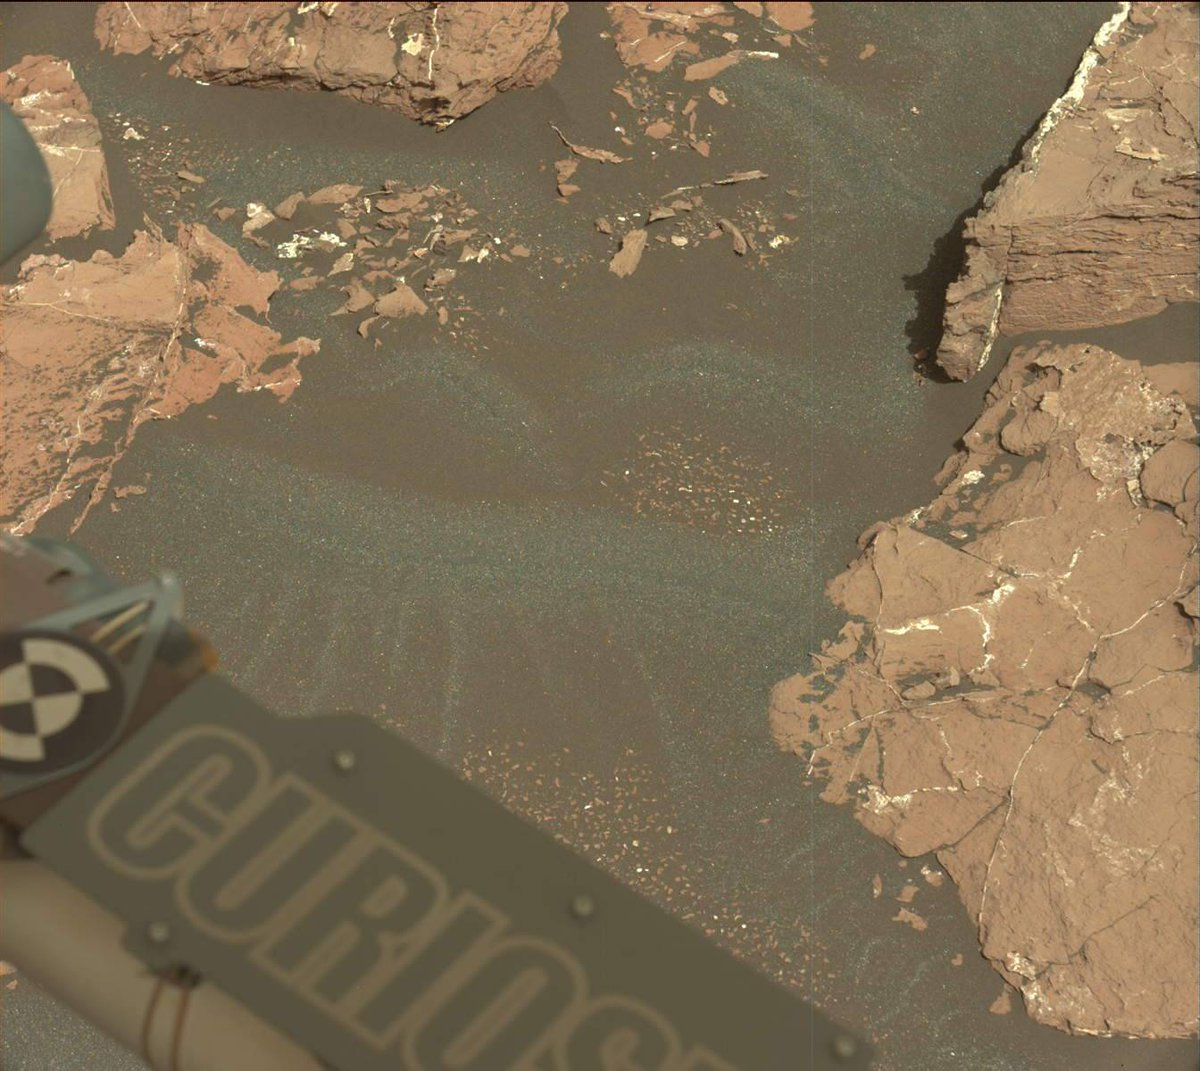 mars rover twitter - photo #14